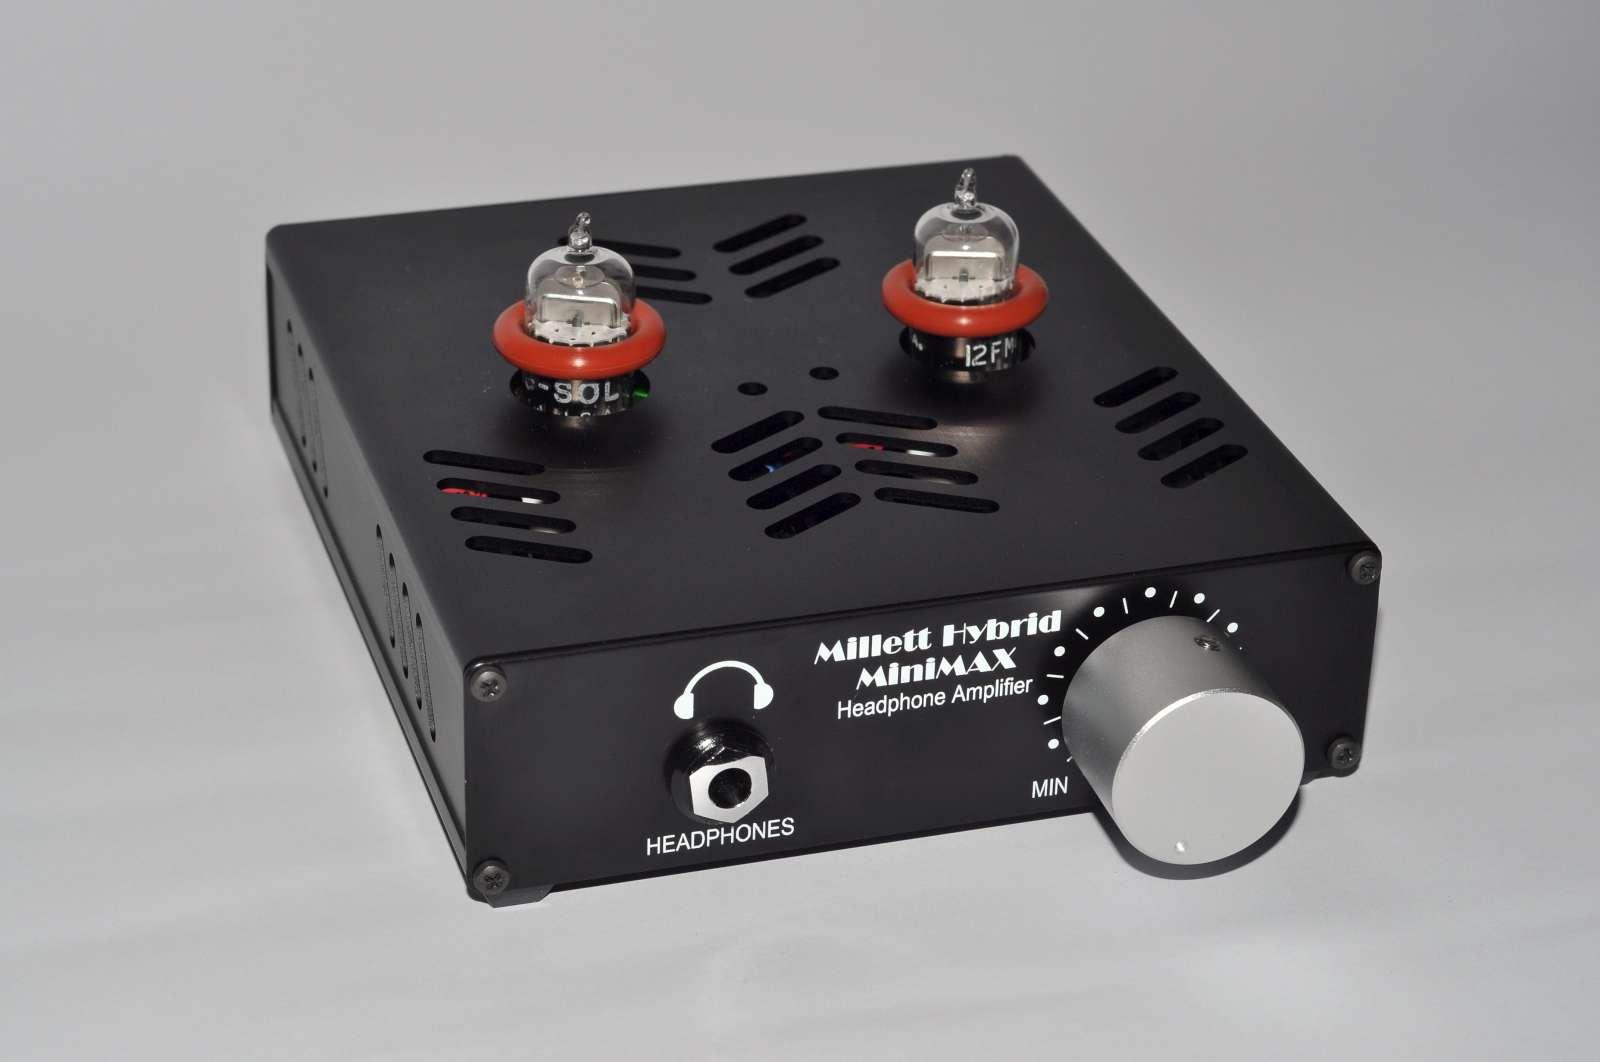 Millett Hybrid MiniMAX Headphone Amplifier  Headfonics